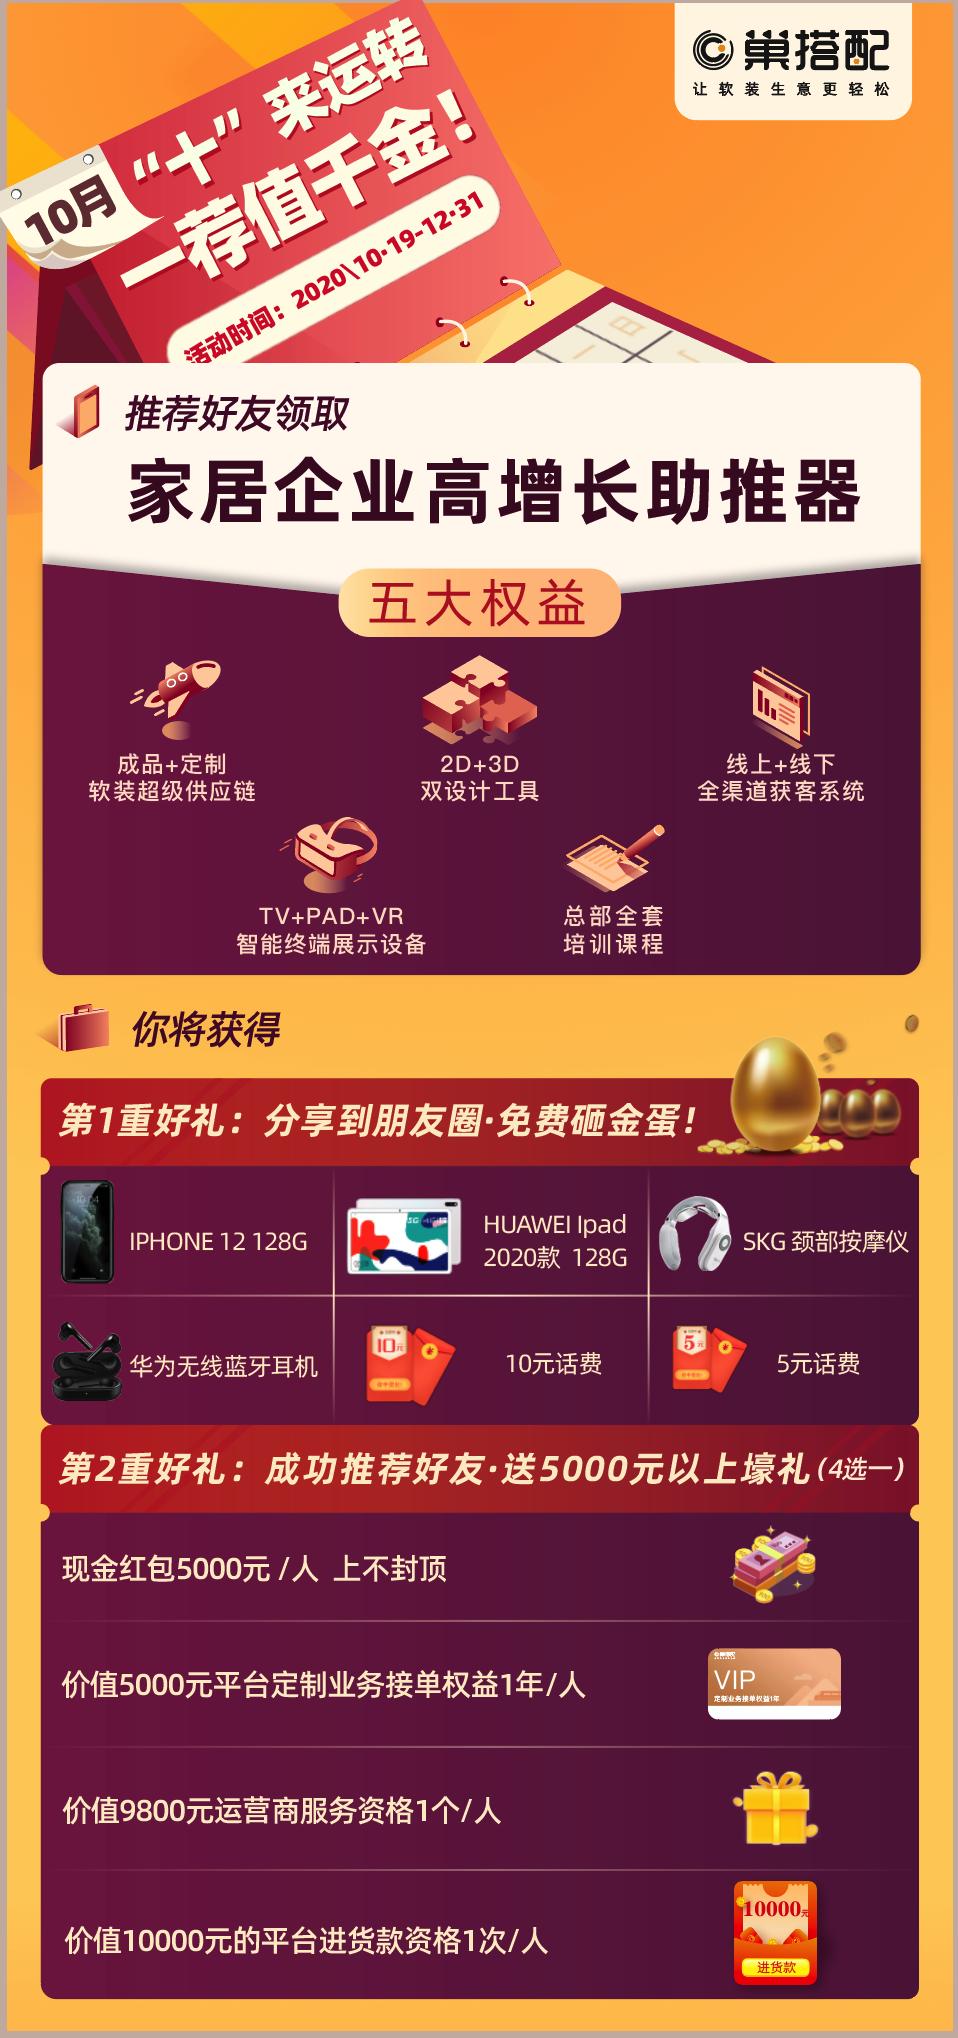 快讯海报.png